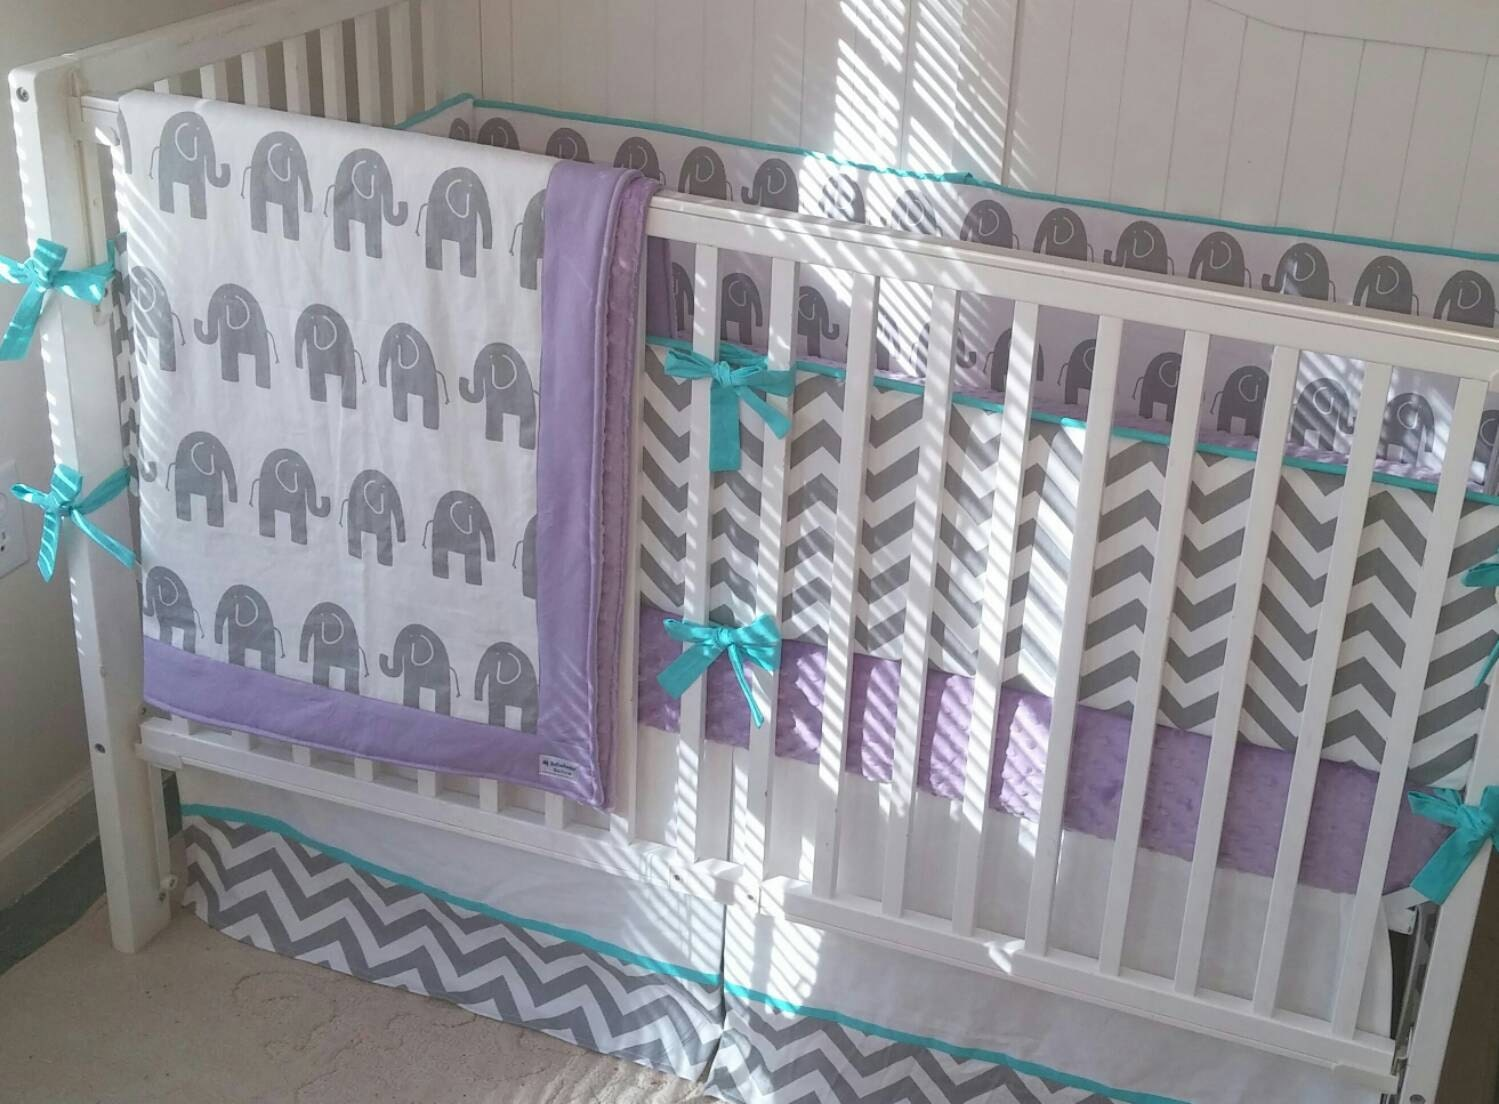 crib bedding set gray aqua and purple elephant. Black Bedroom Furniture Sets. Home Design Ideas